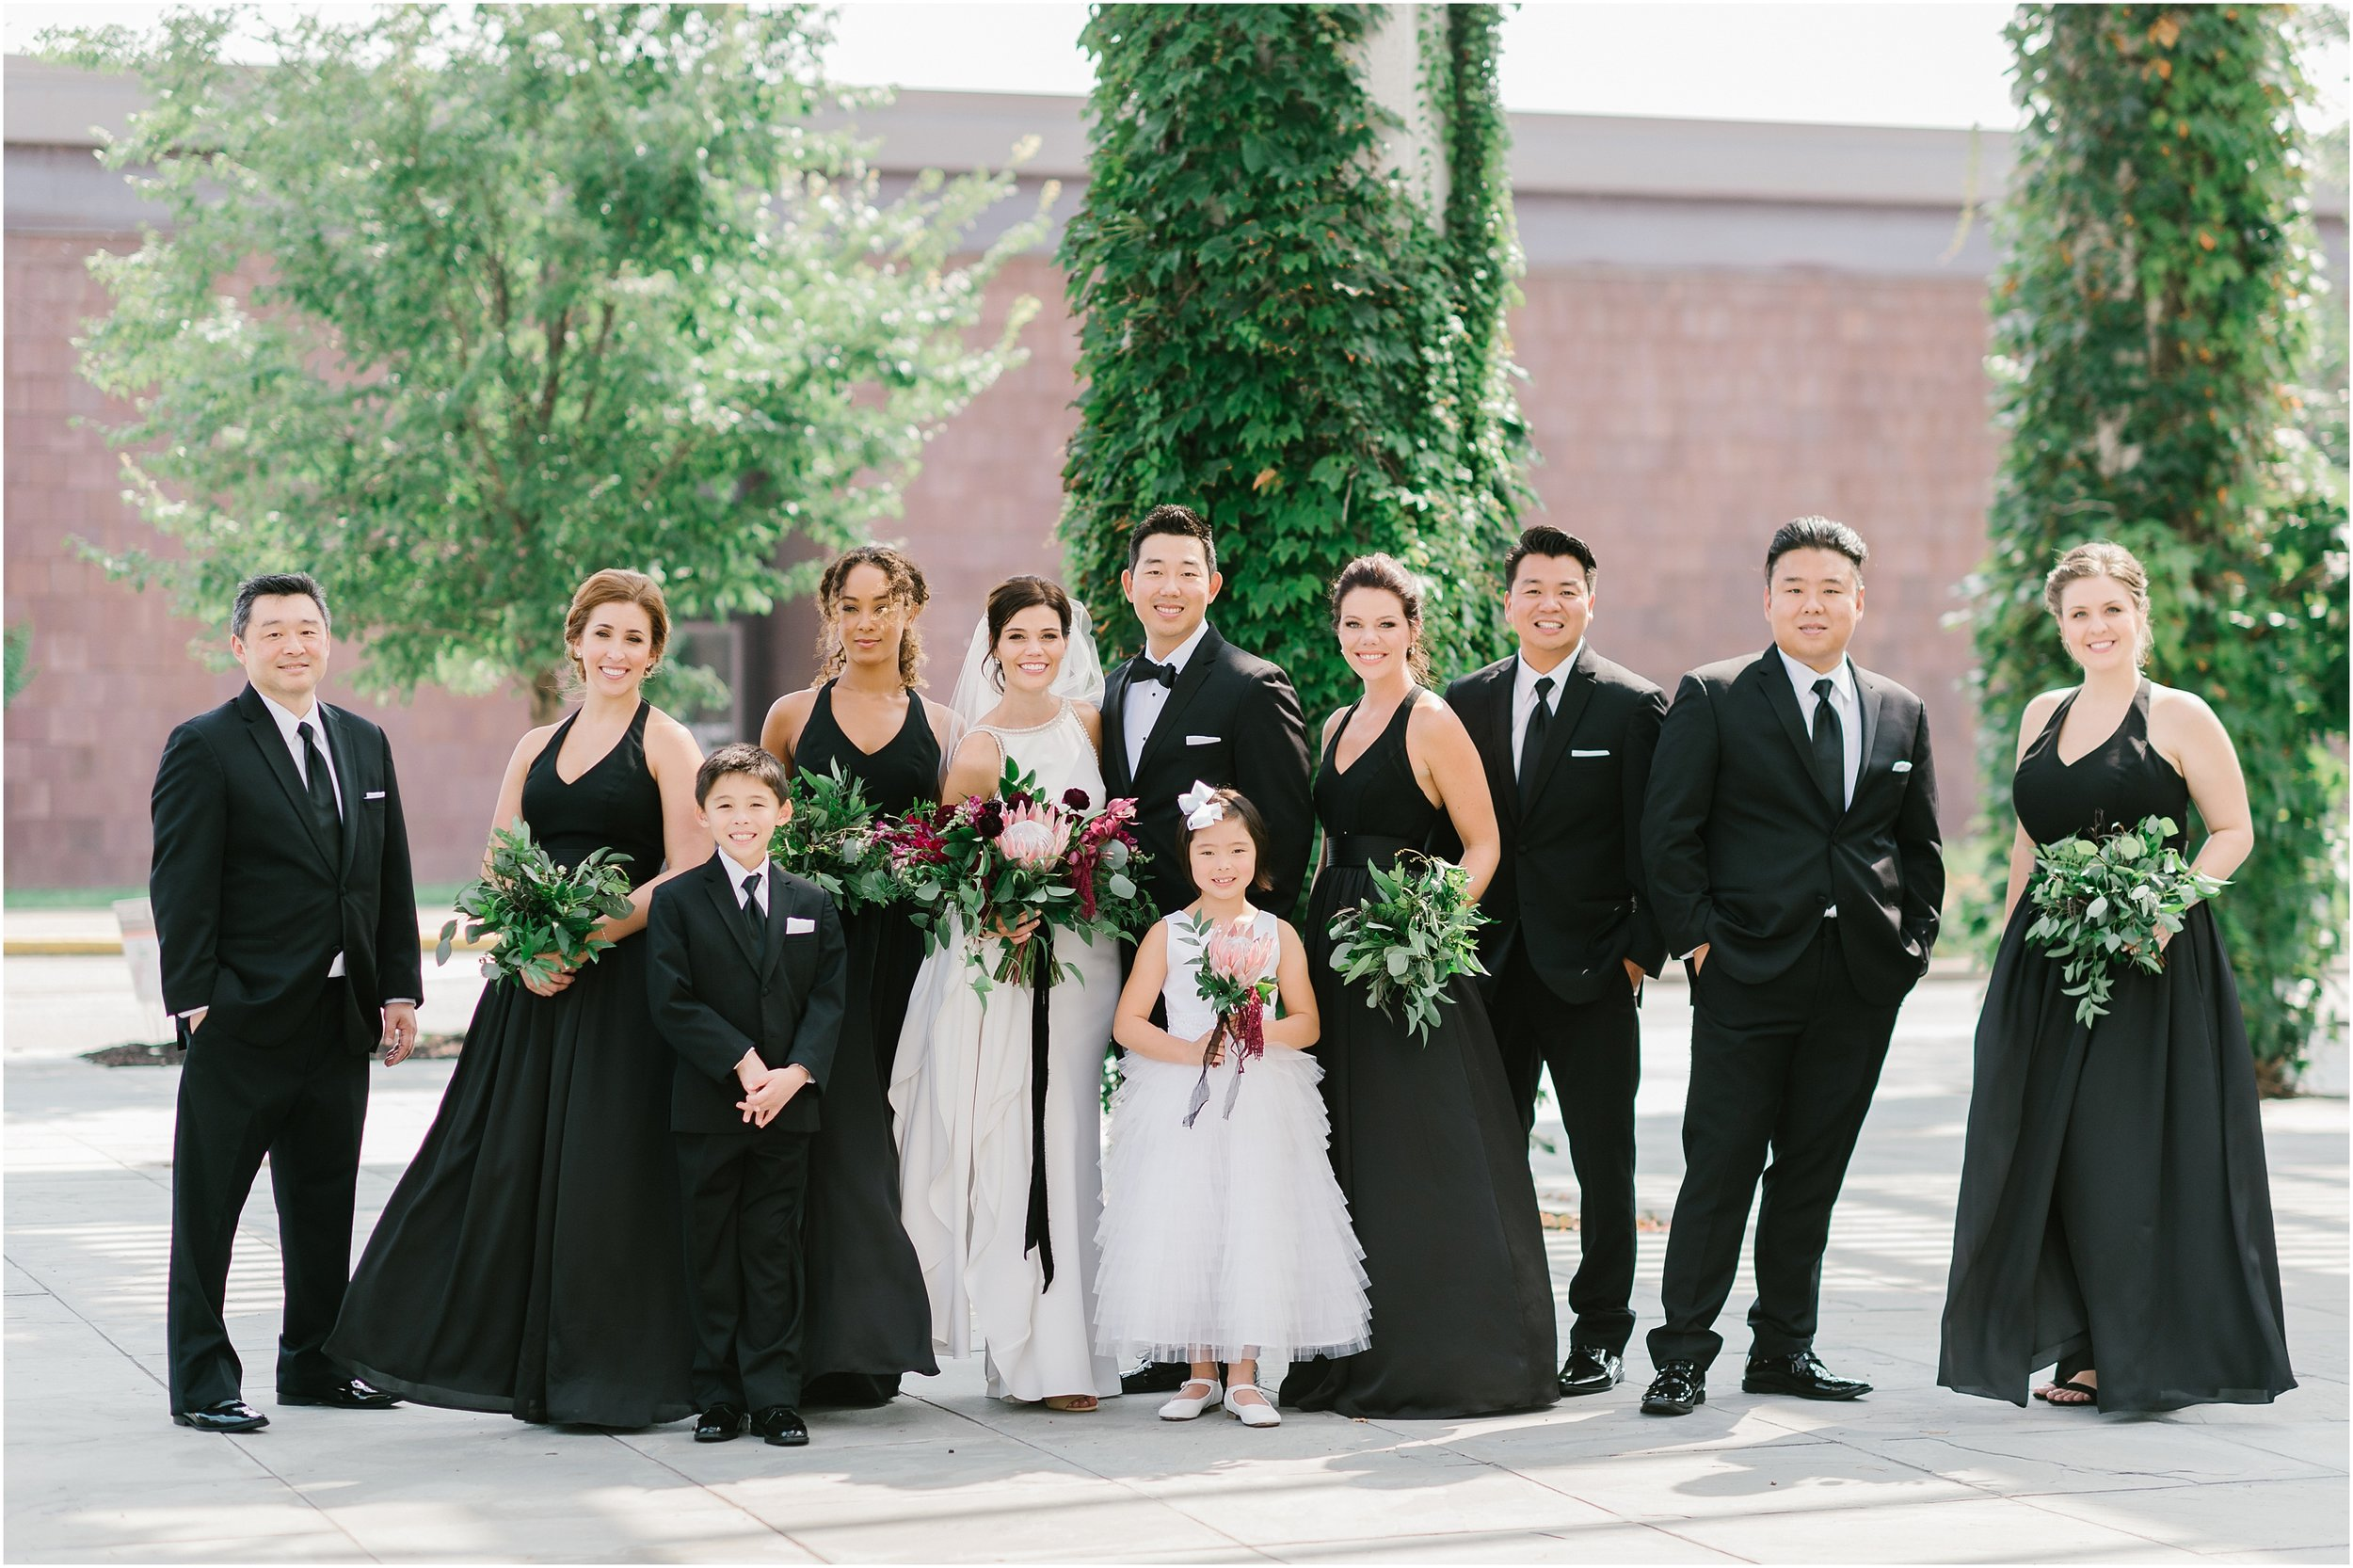 Rebecca_Shehorn_Photography_Indianapolis Wedding Photographer Sycamore at Mallow Run Wedding_9735.jpg